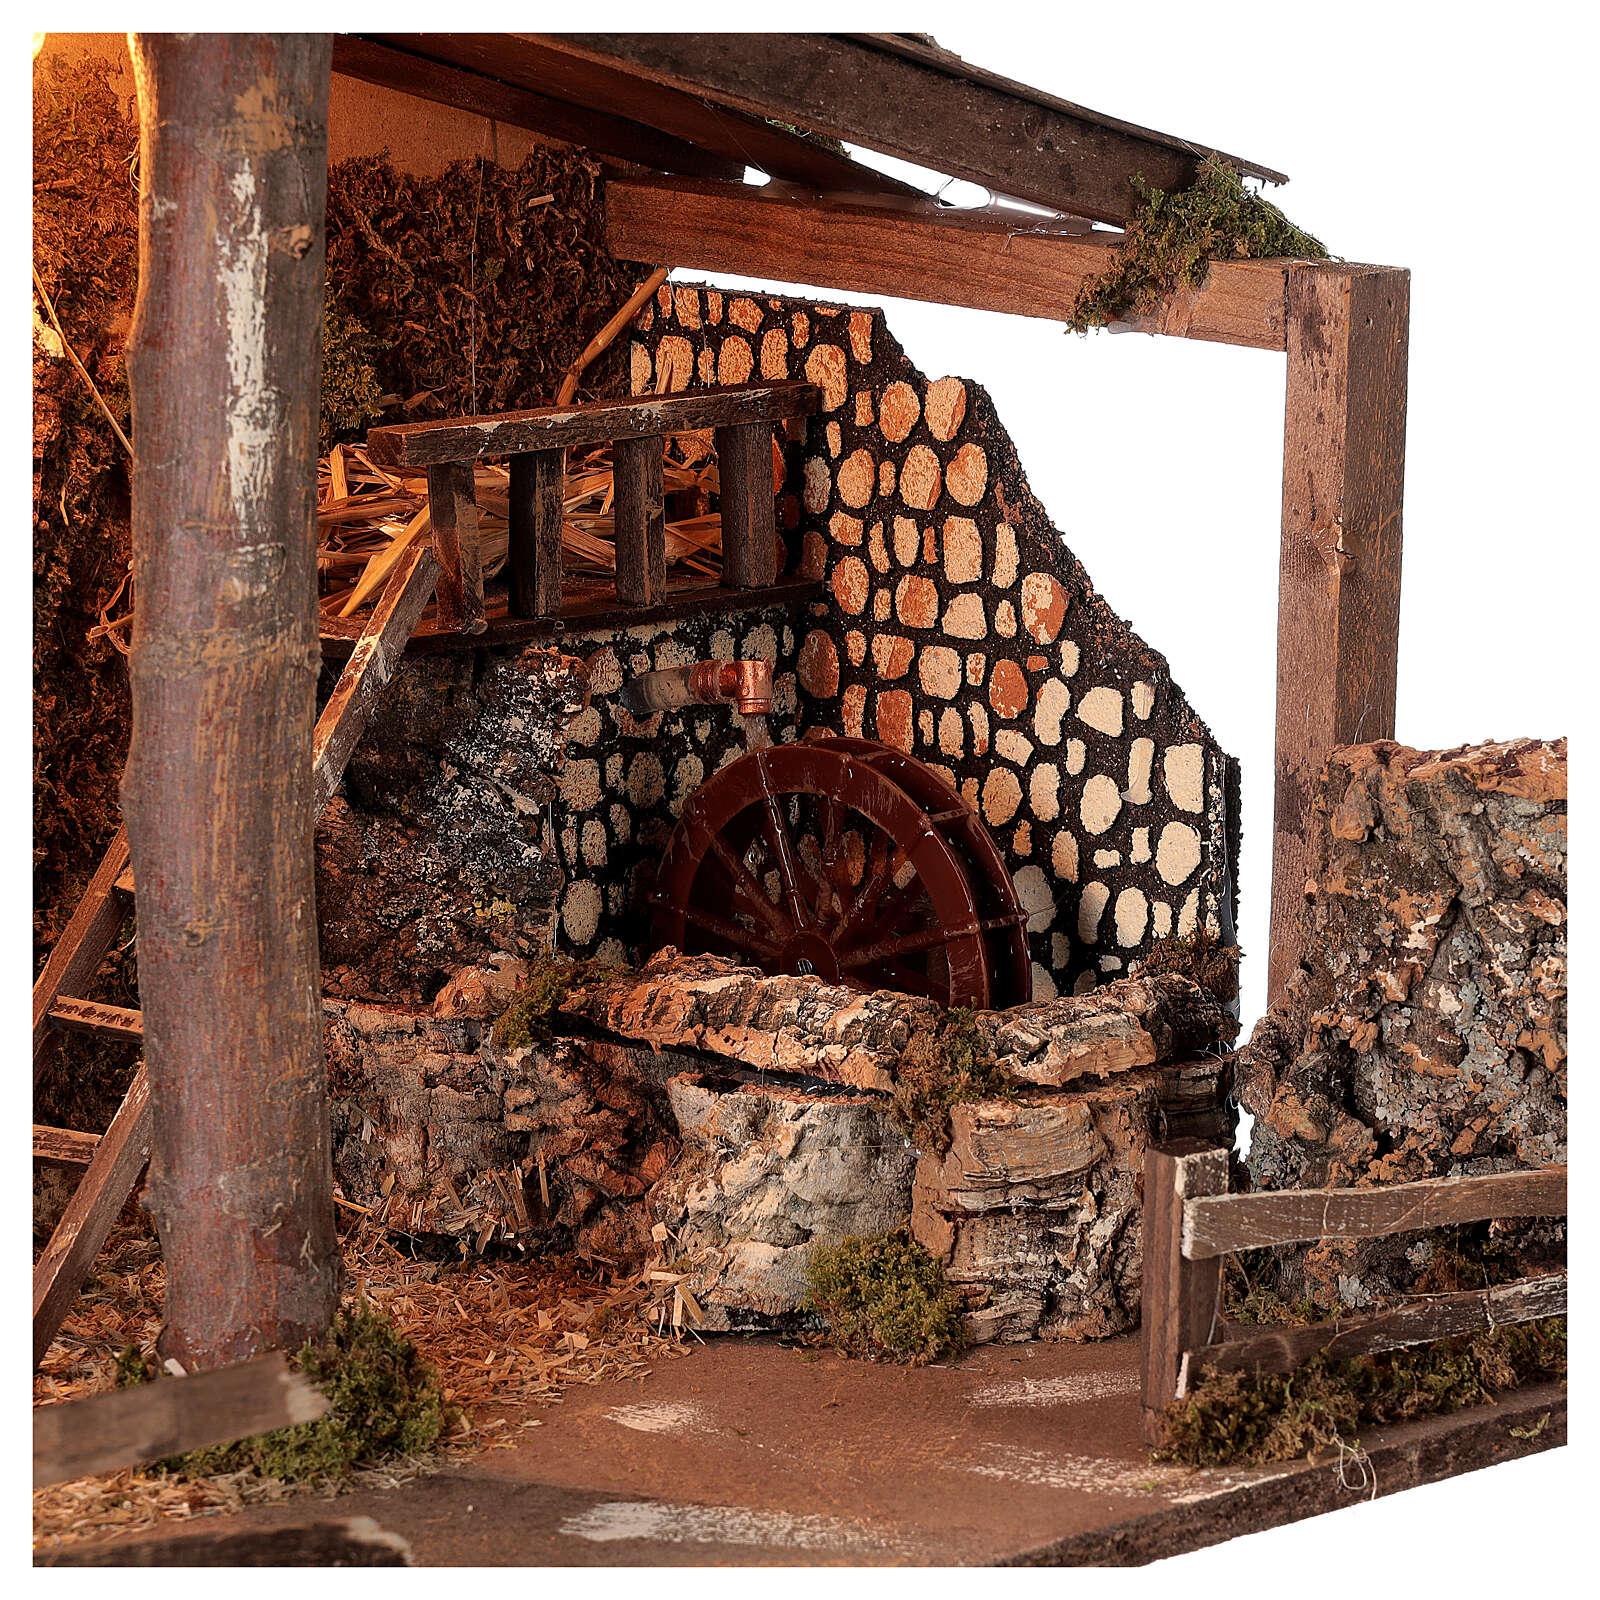 Capanna Natività presepe mulino acqua 45x60x35 cm per statue 14-16 cm 4